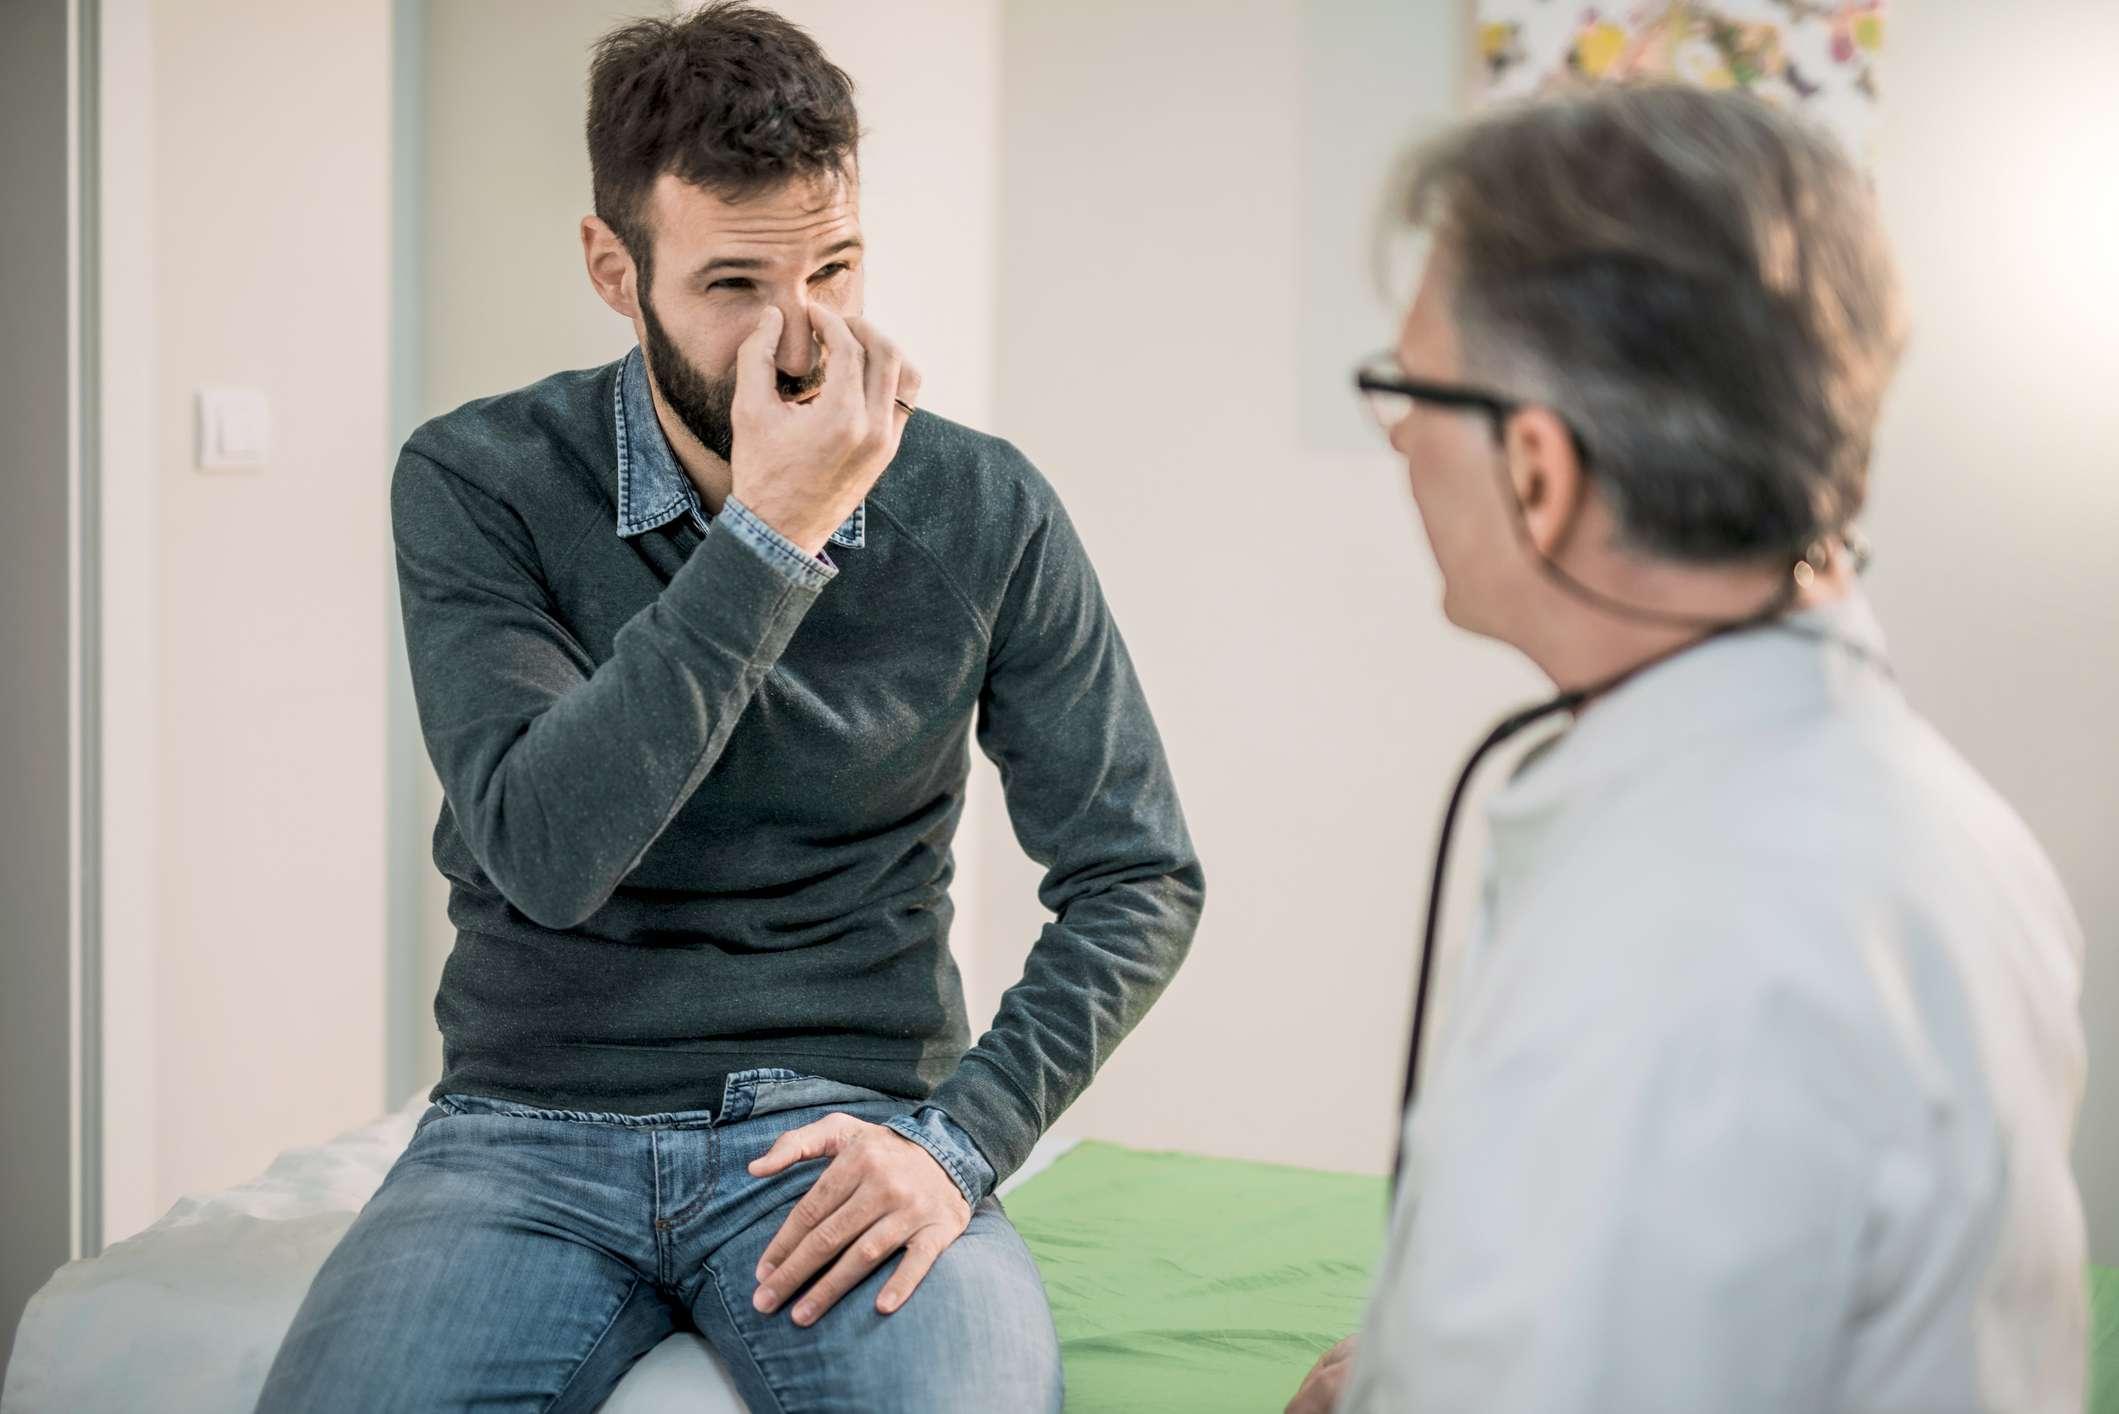 Man describing symptoms